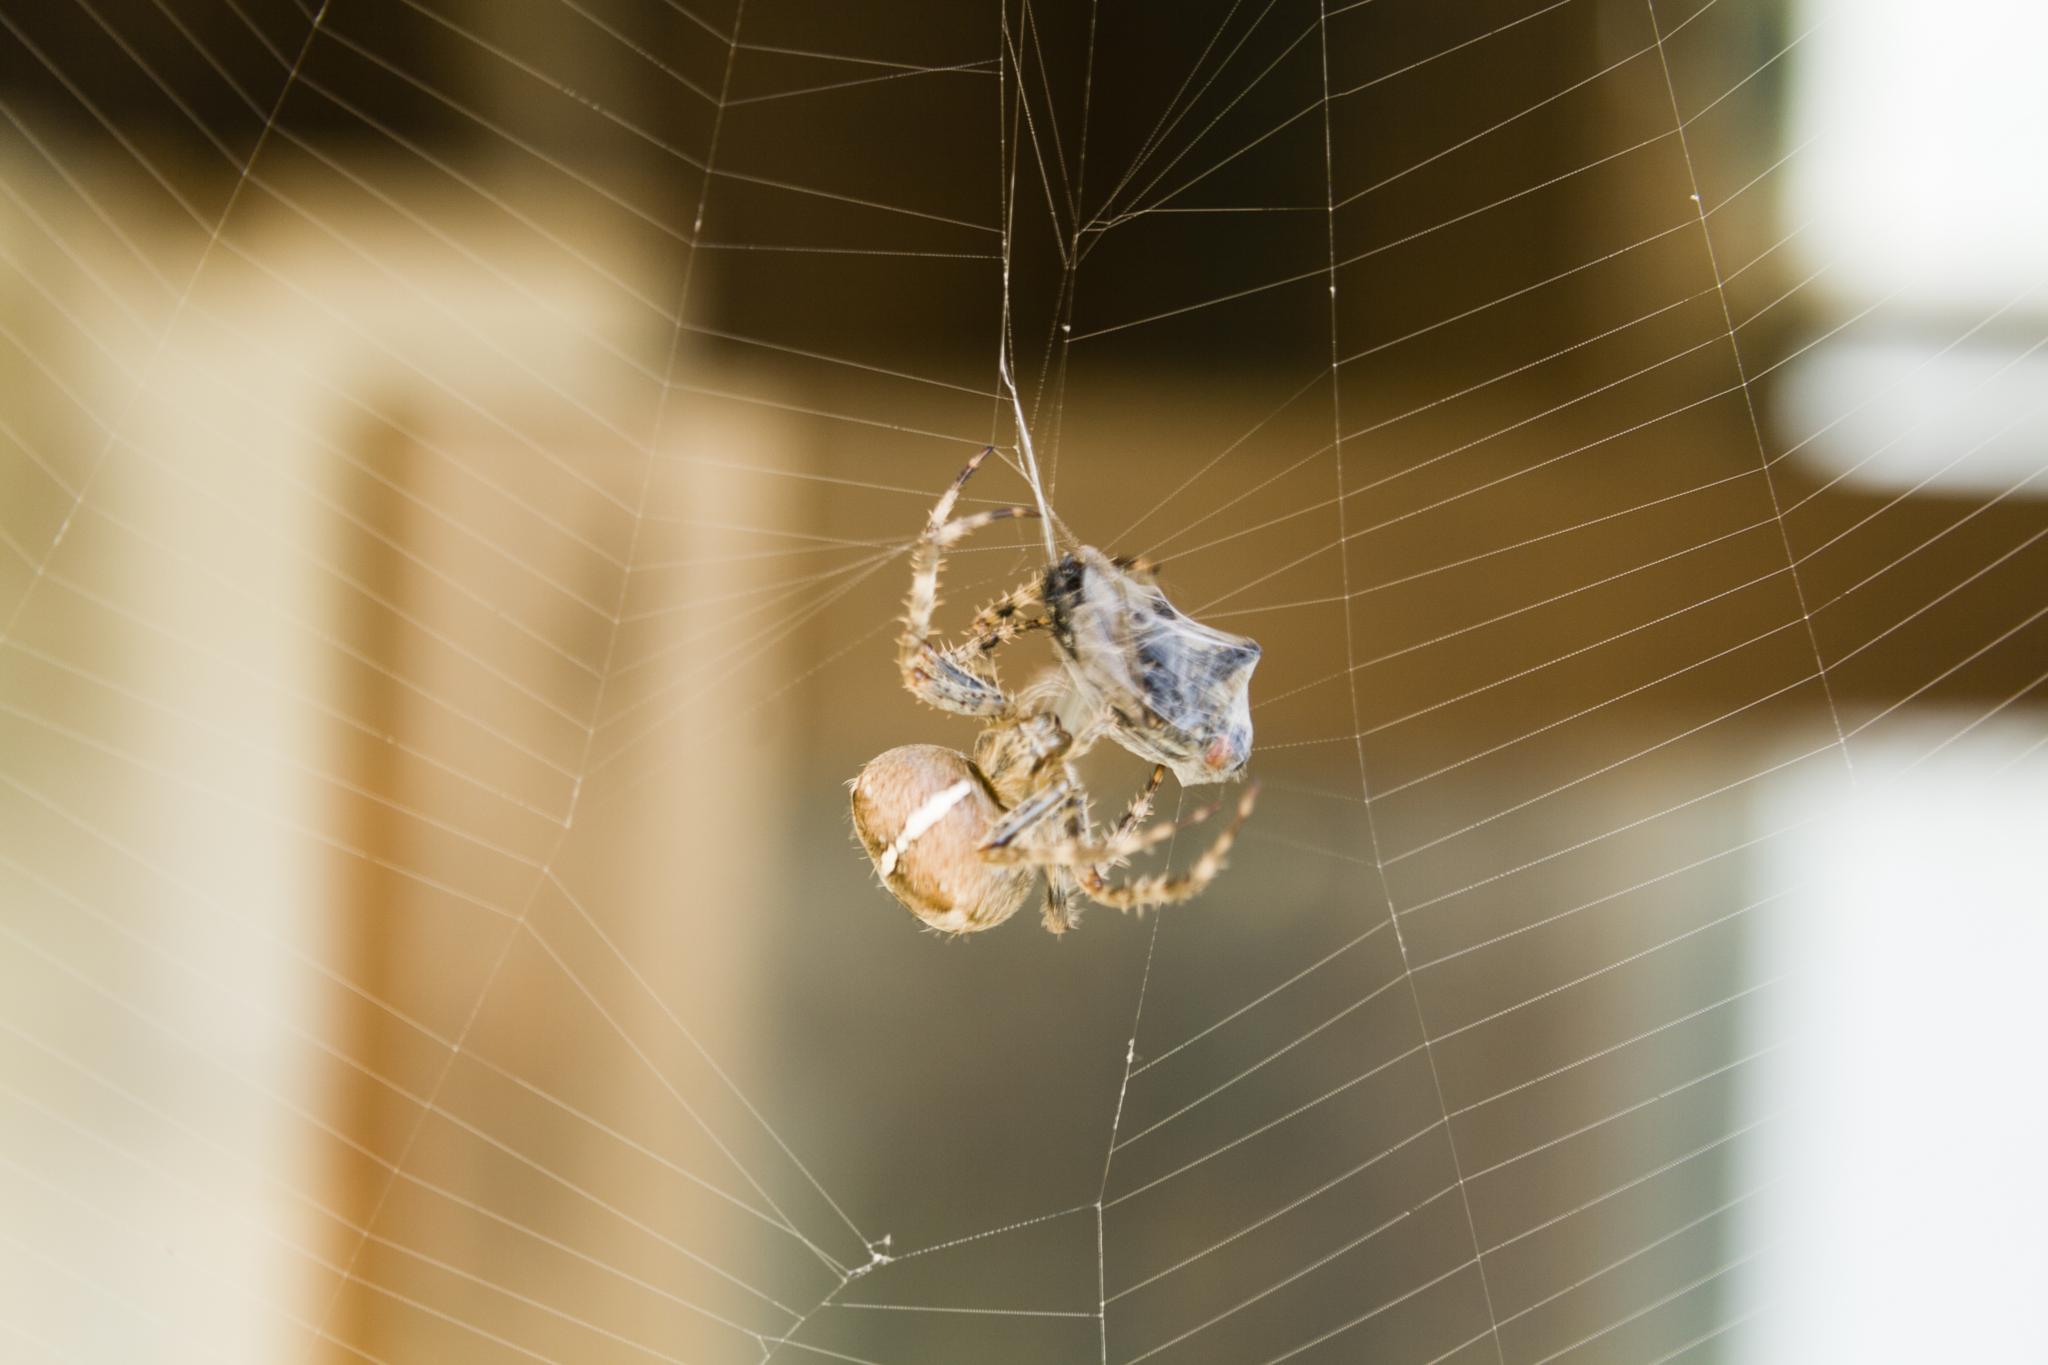 Silk Spraying ! by Nature's Pixelator